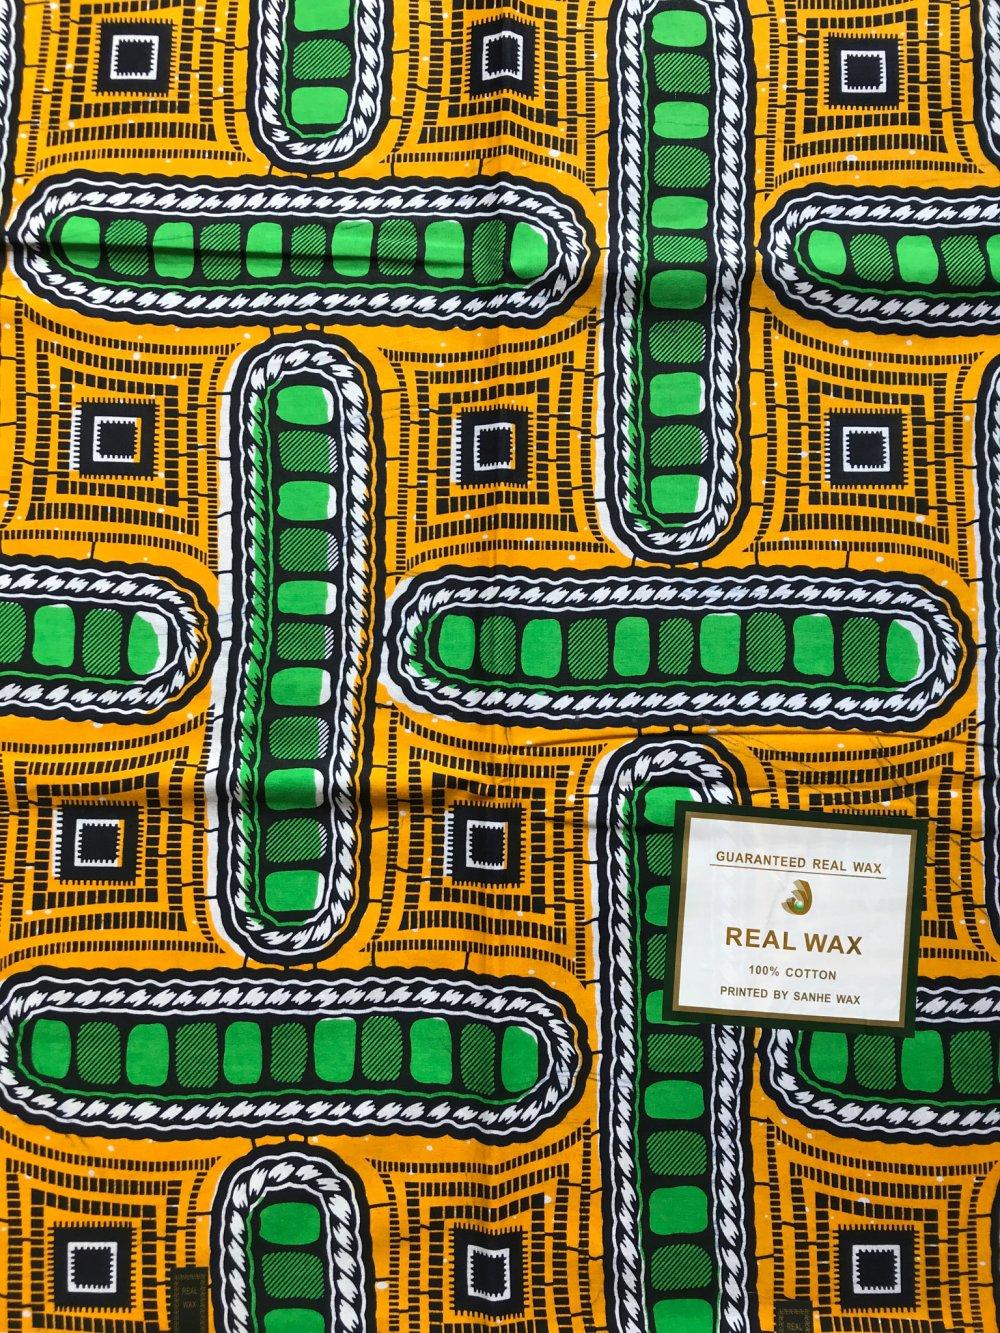 Tissu wax africain qualité premium, 1 mètre x 110com